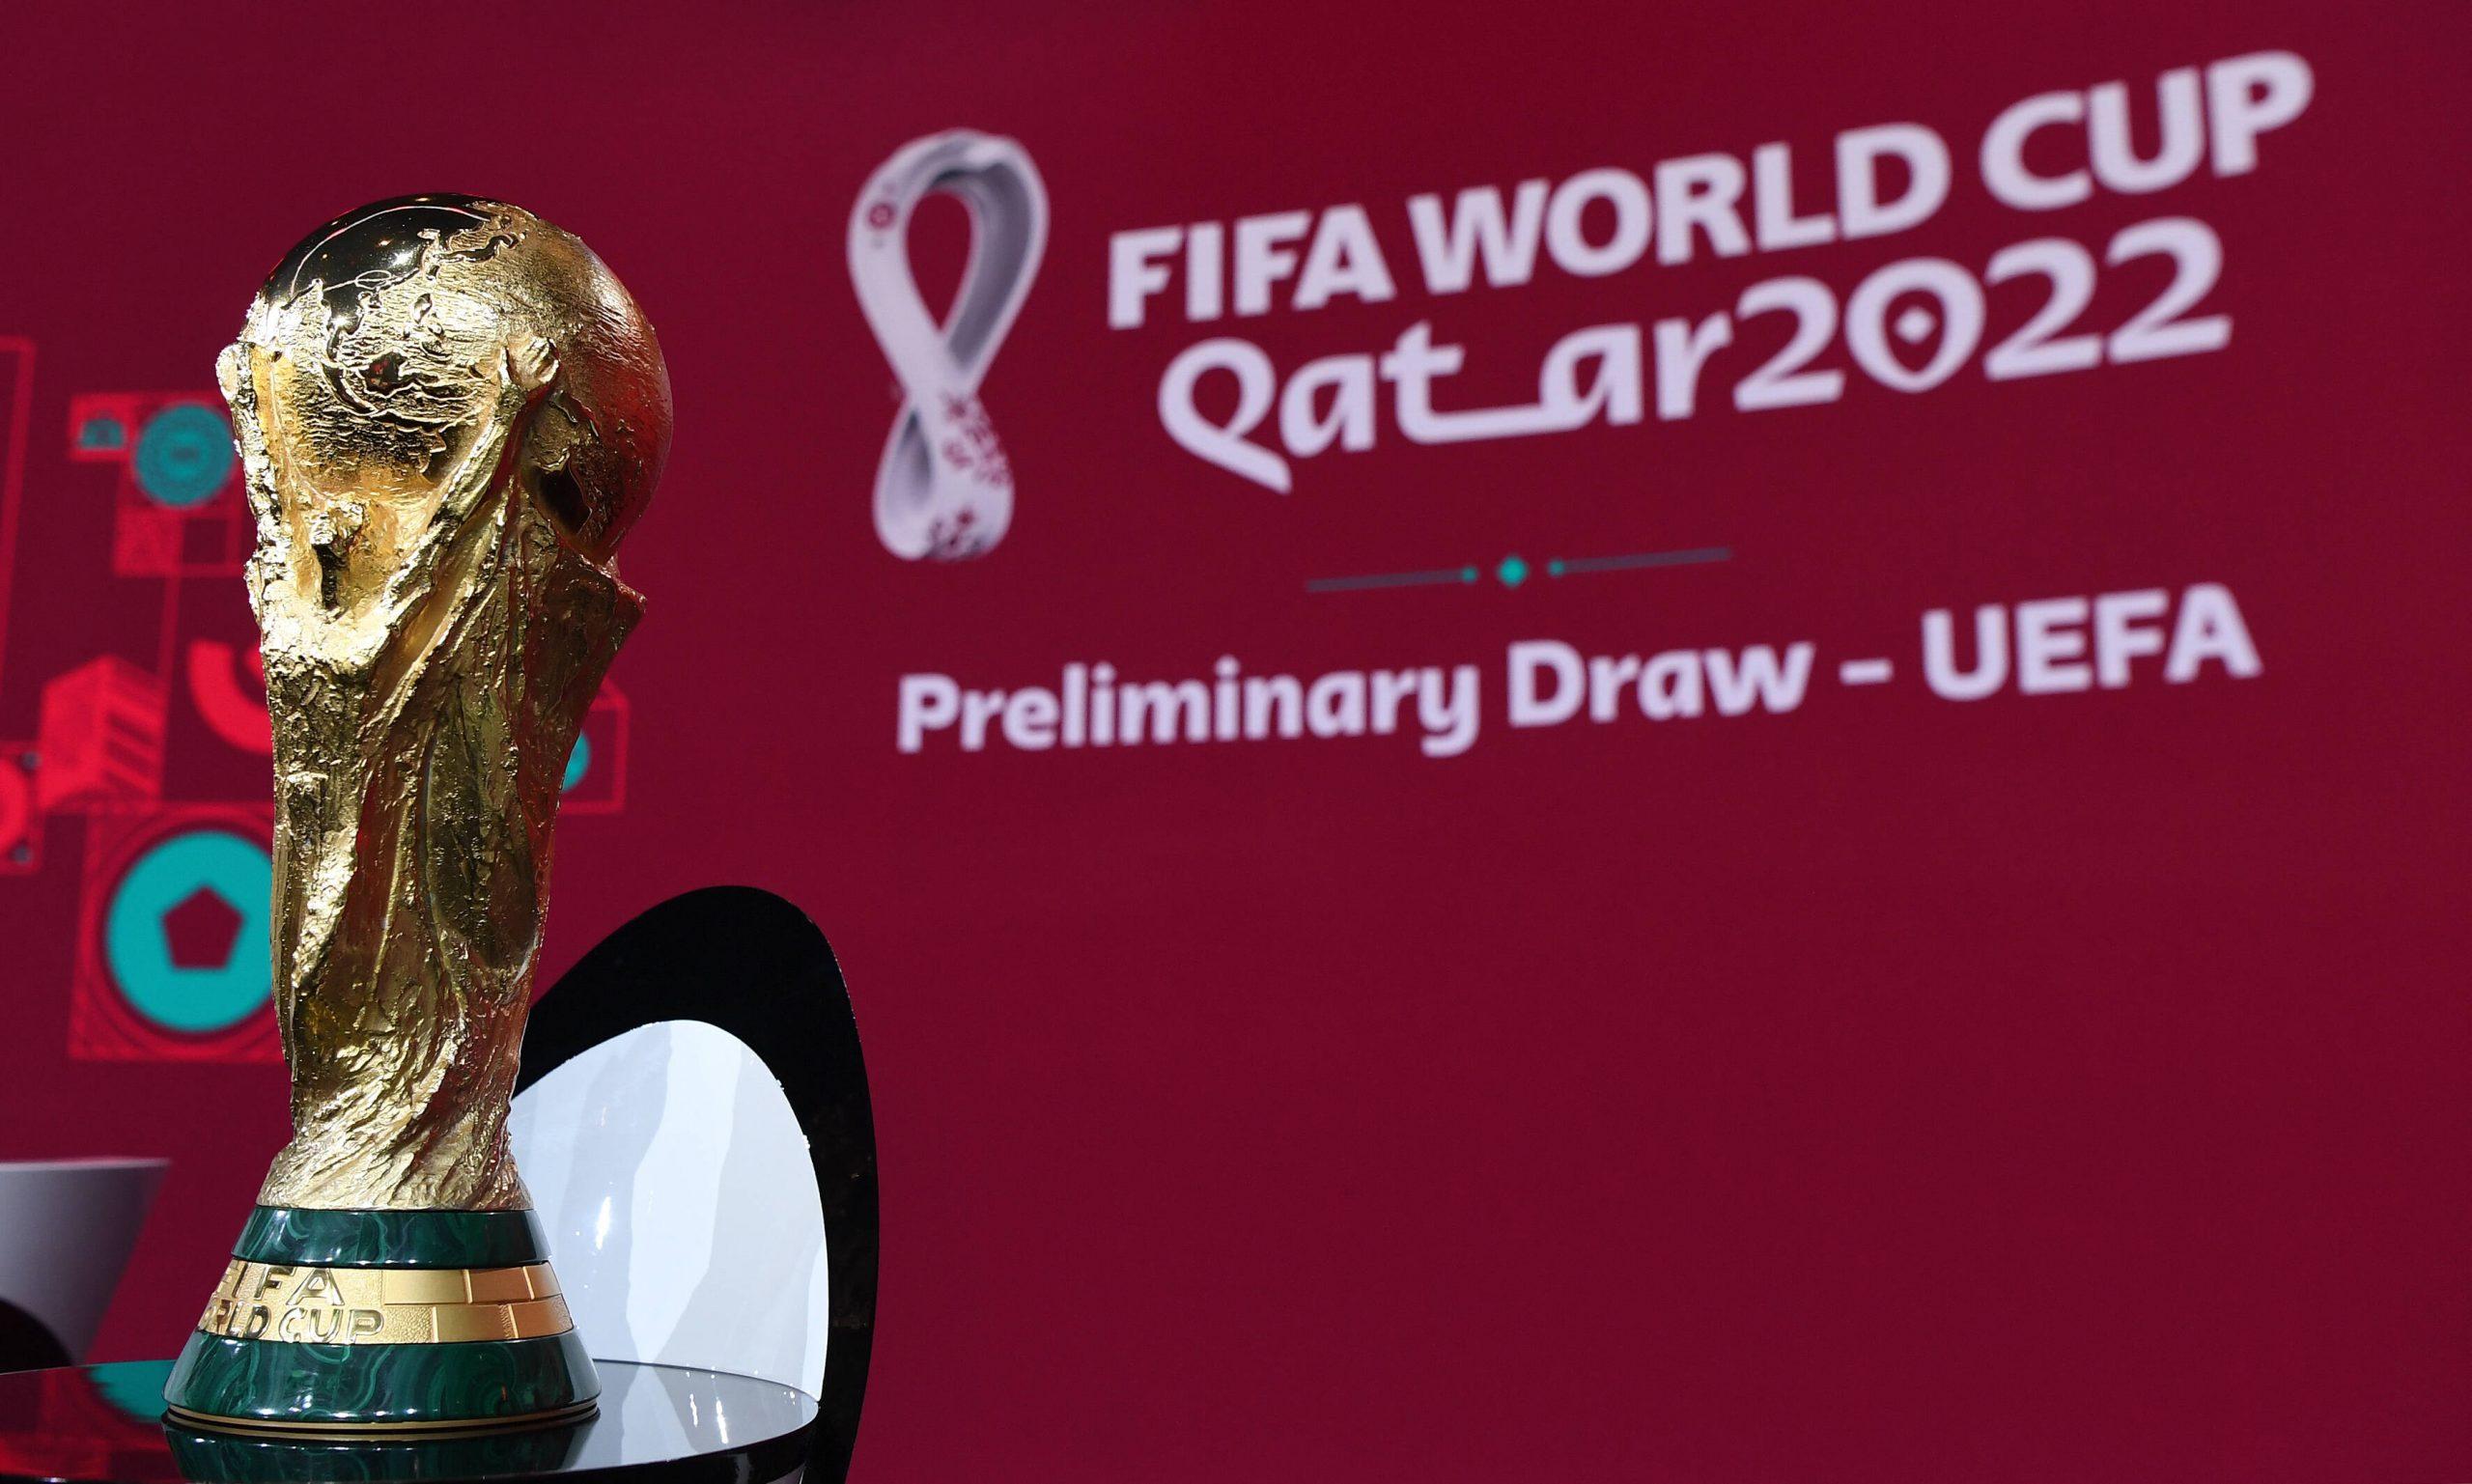 World Cup Qualfication